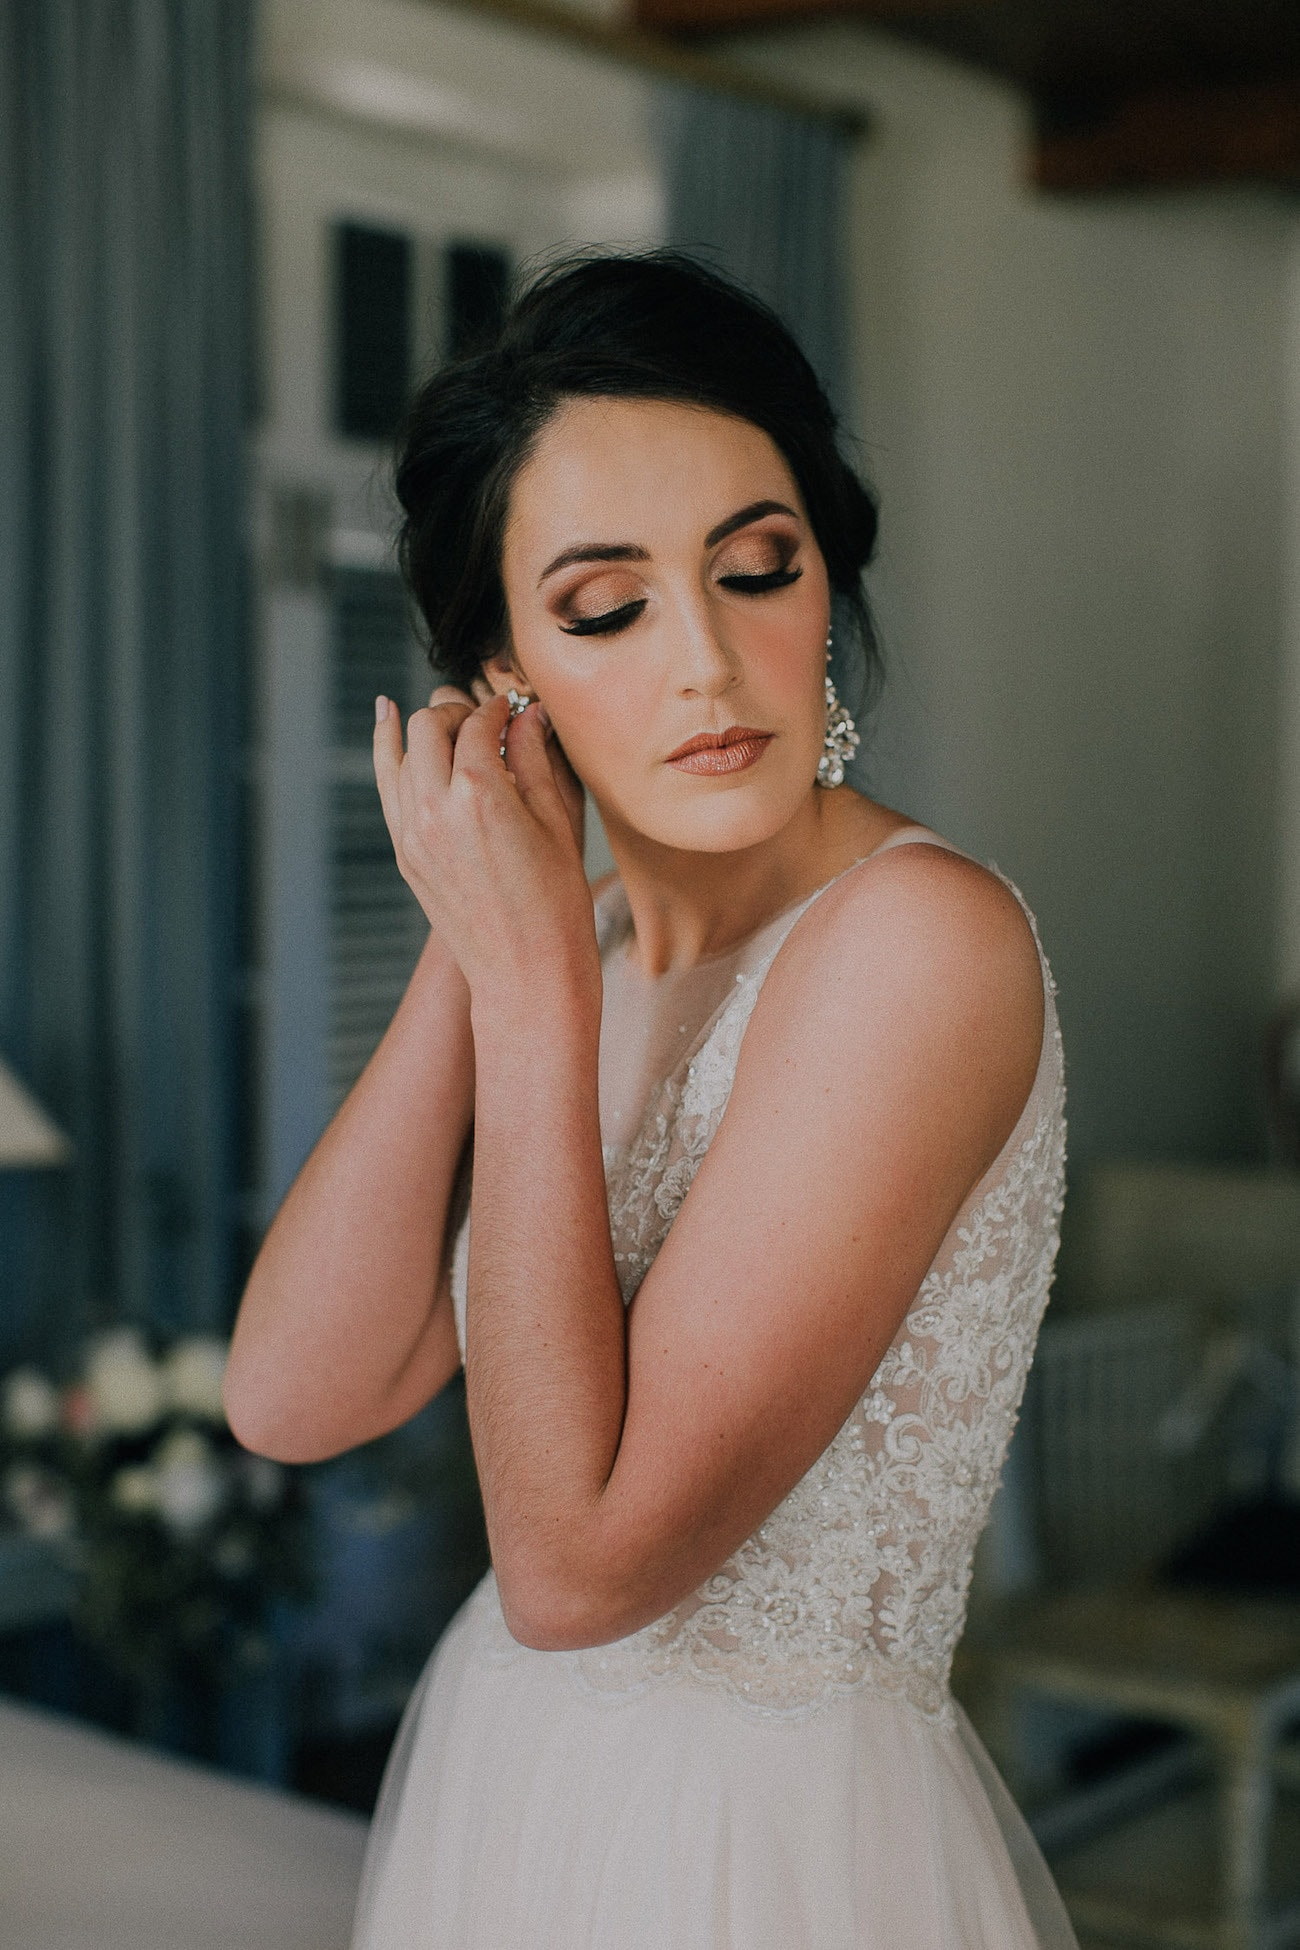 Janita Toerien Wedding Dress | Image: Michelle du Toit